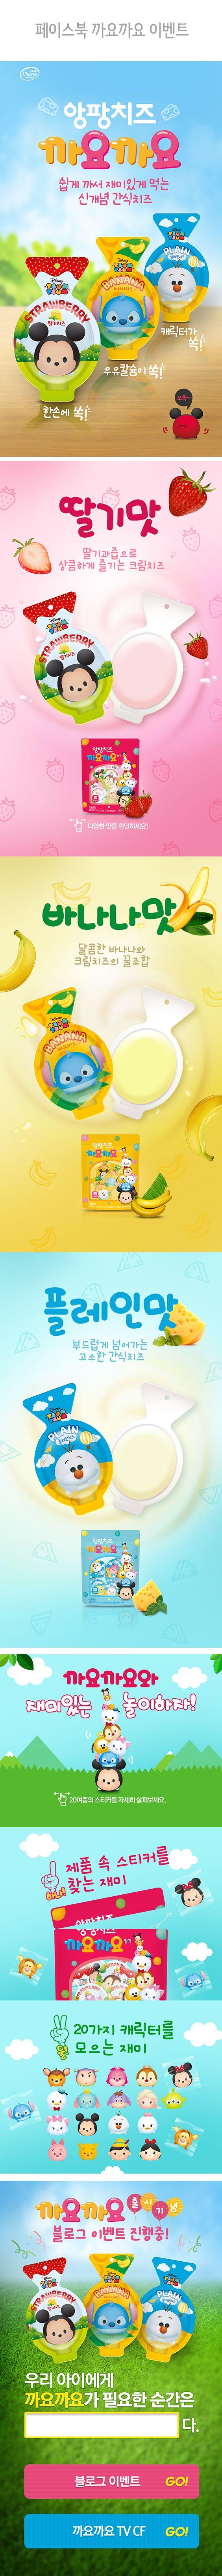 #portfolio #서울우유 #Facebook #까요까요 #앙팡치즈 #Event Design #Promotion